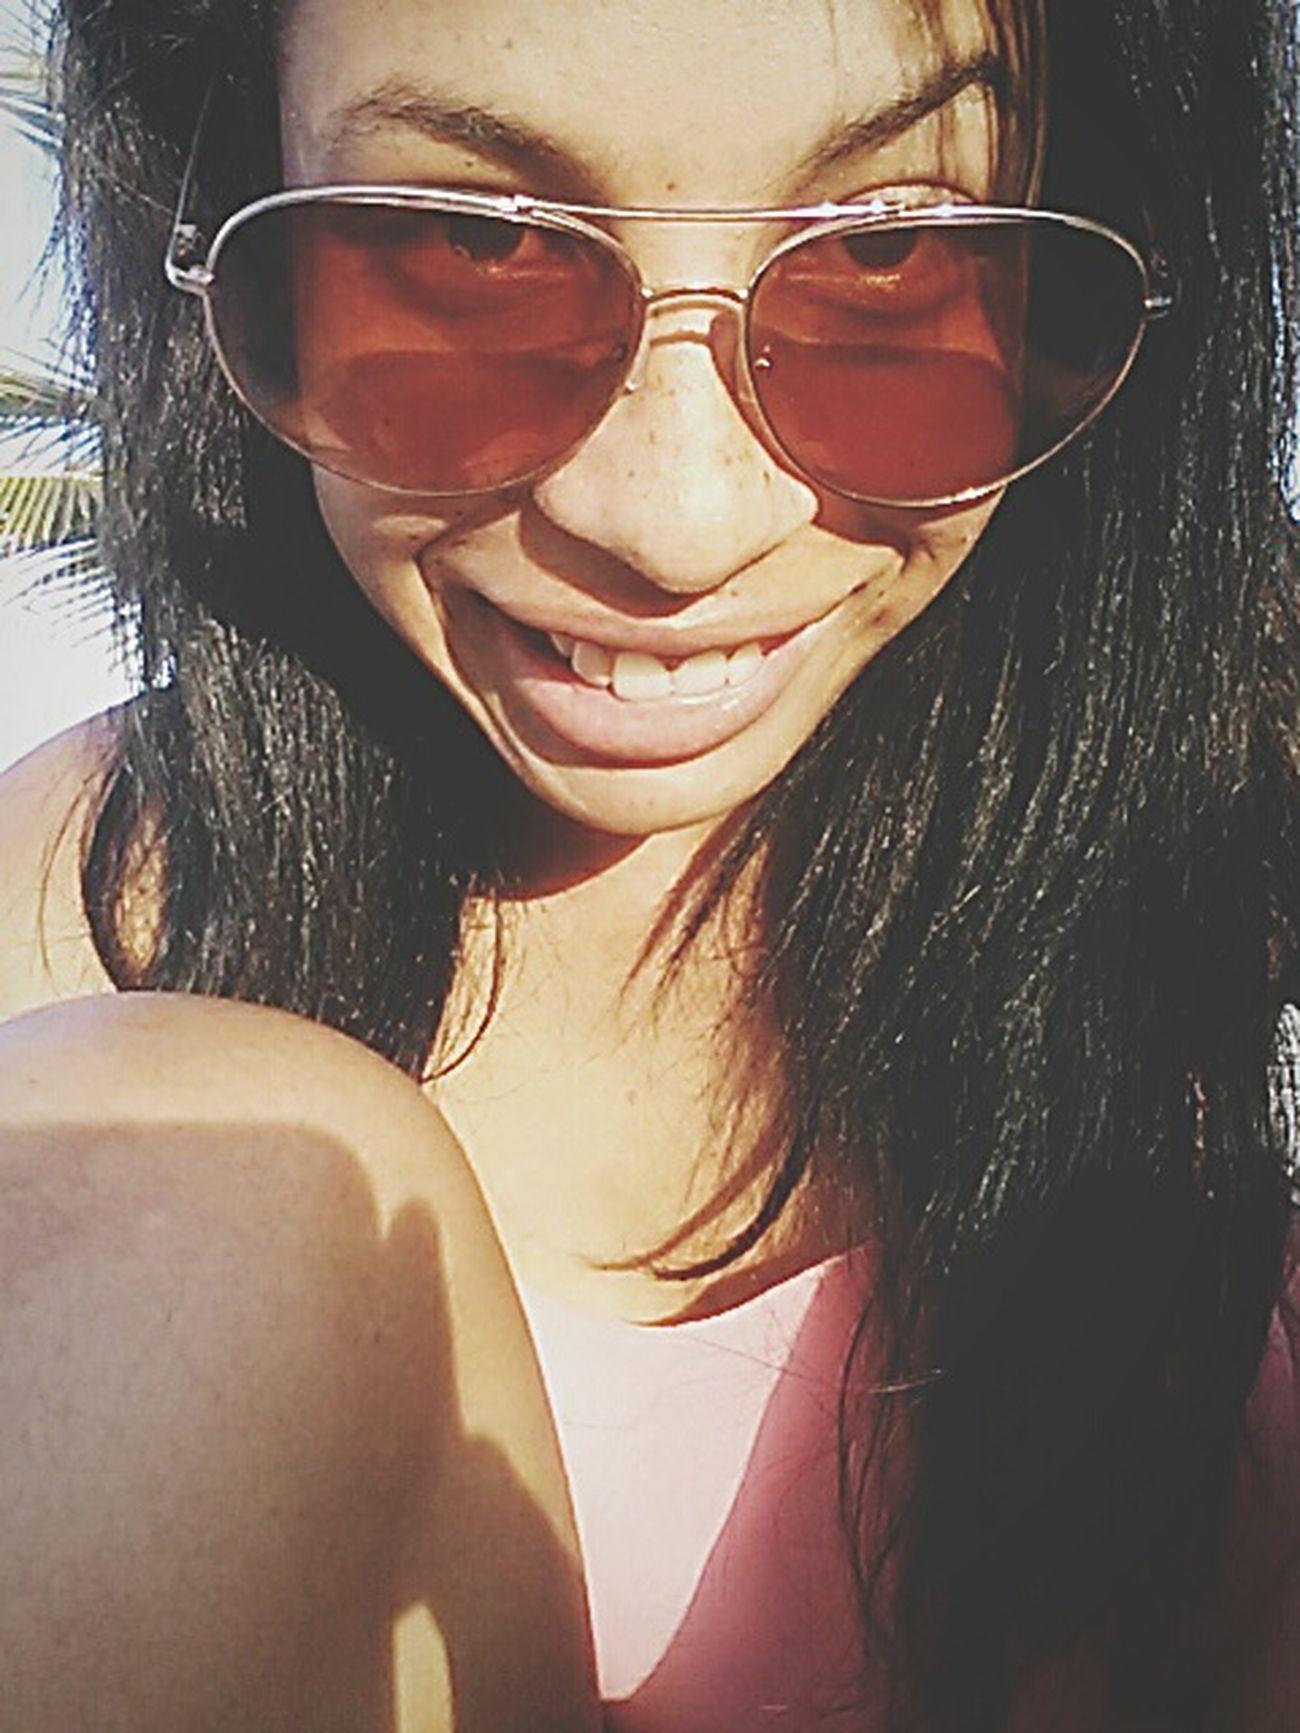 Que o vento leve tudo que me faz mal, e que o tempo traga tudo quebme faça sorrir... EyeEm Nature Lover Sun Sea...